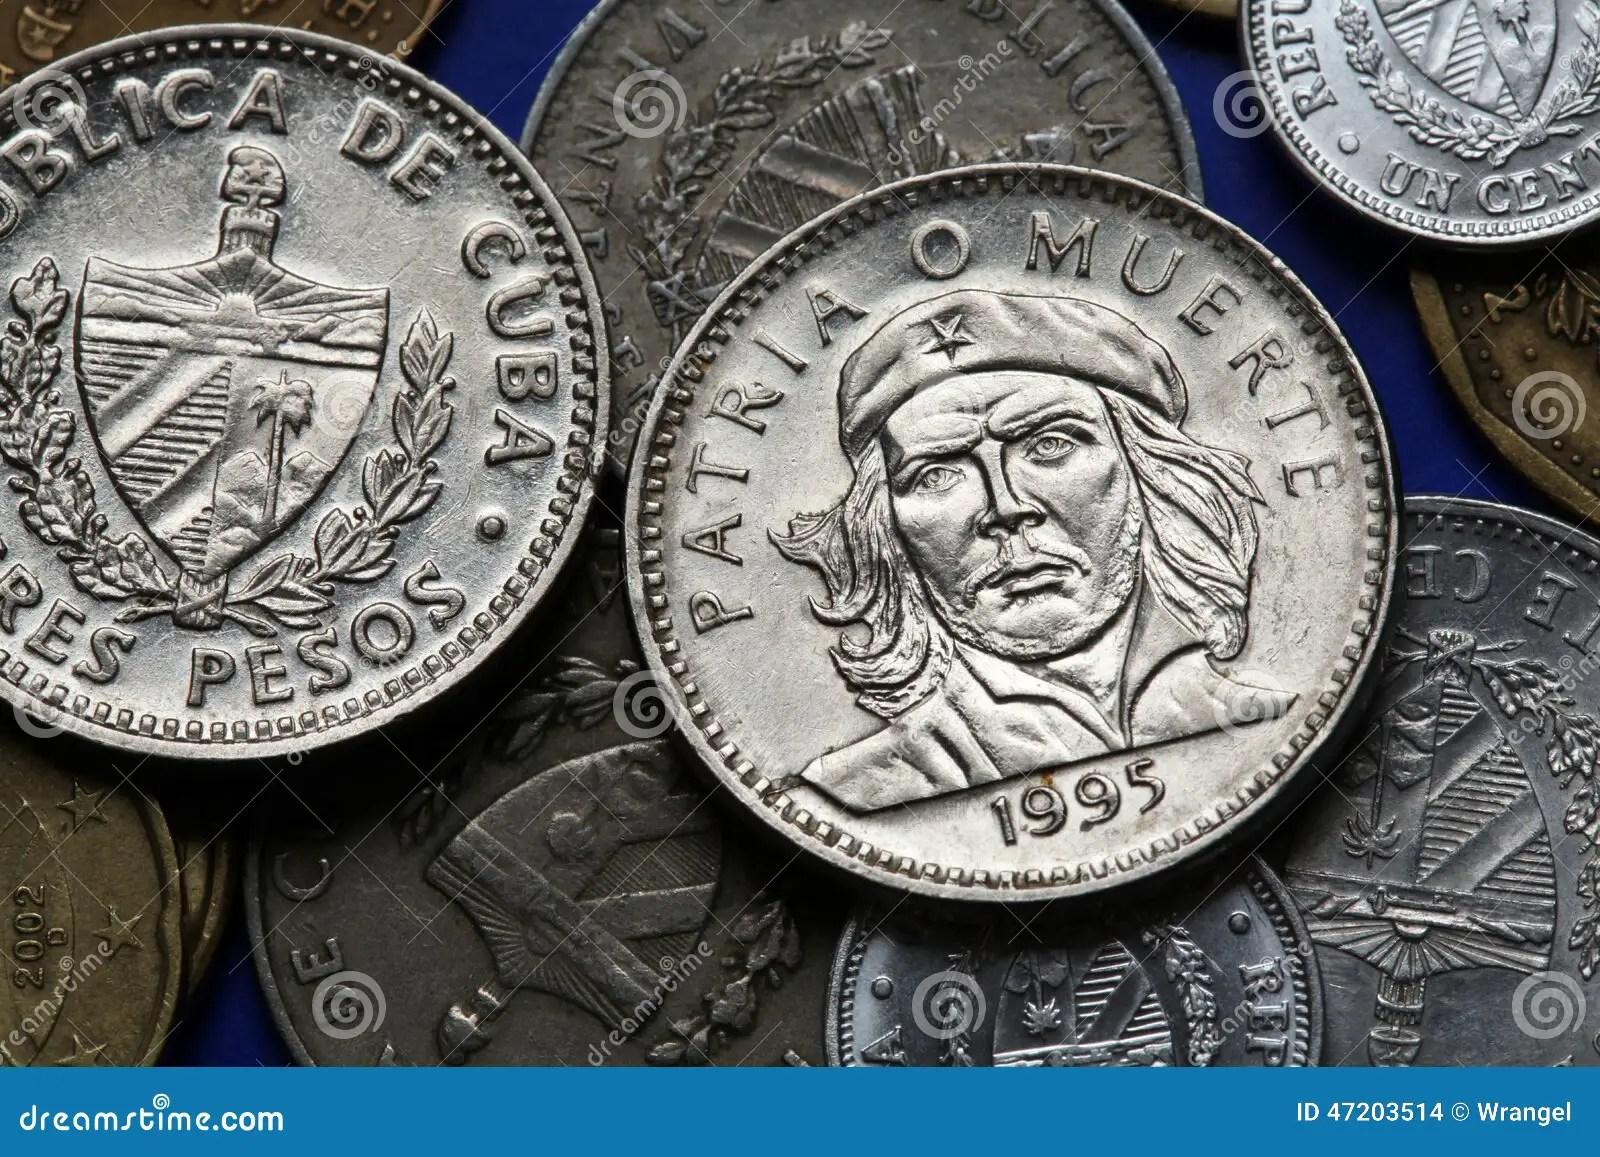 Cuba 3d Wallpaper Pi 232 Ces De Monnaie Du Cuba Ernesto Che Guevara Photo Stock